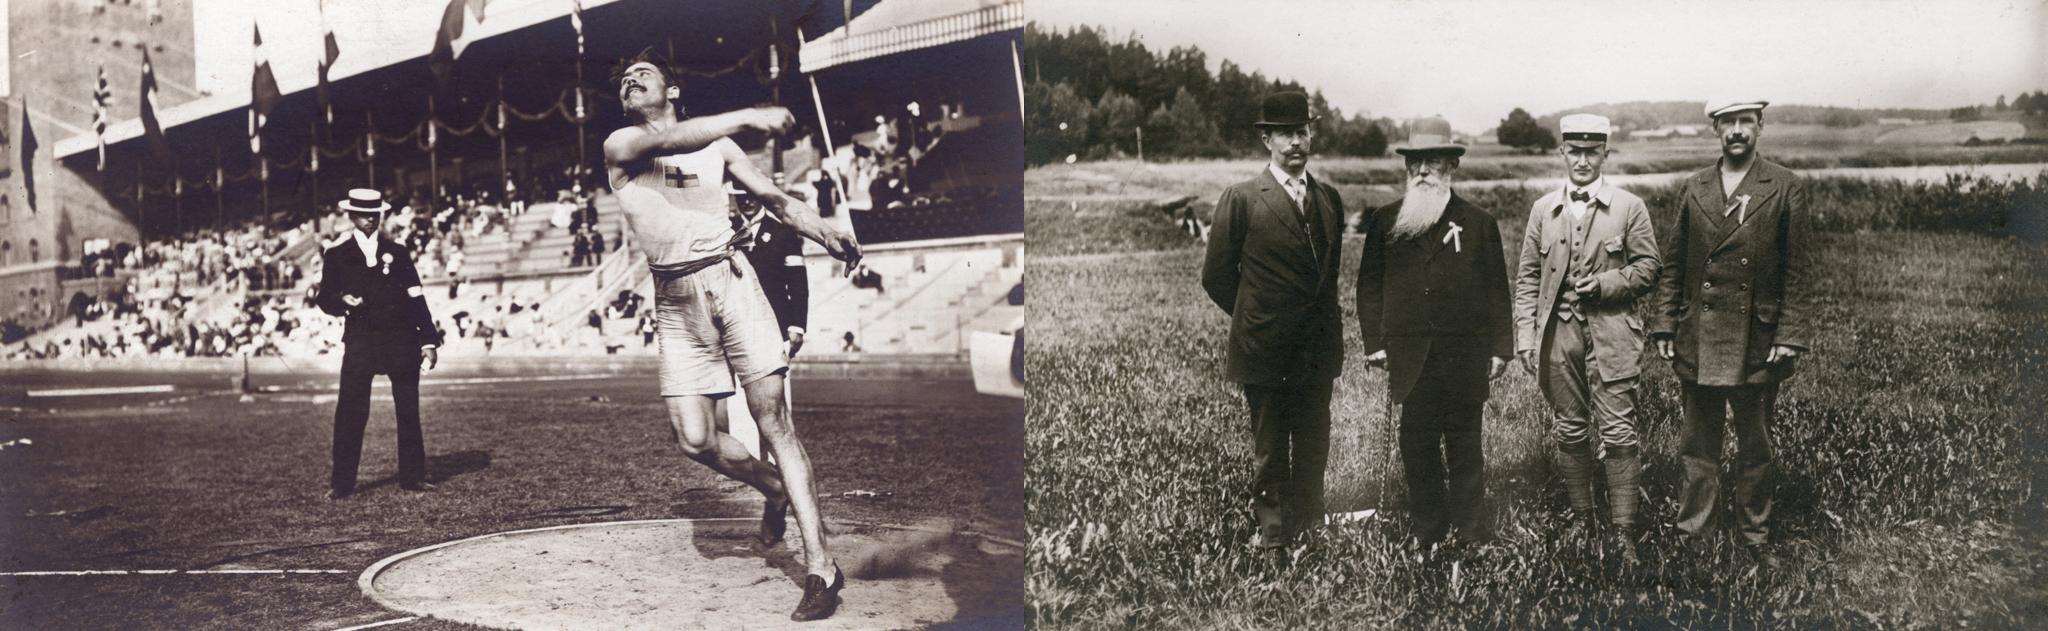 Olympic Blog 1